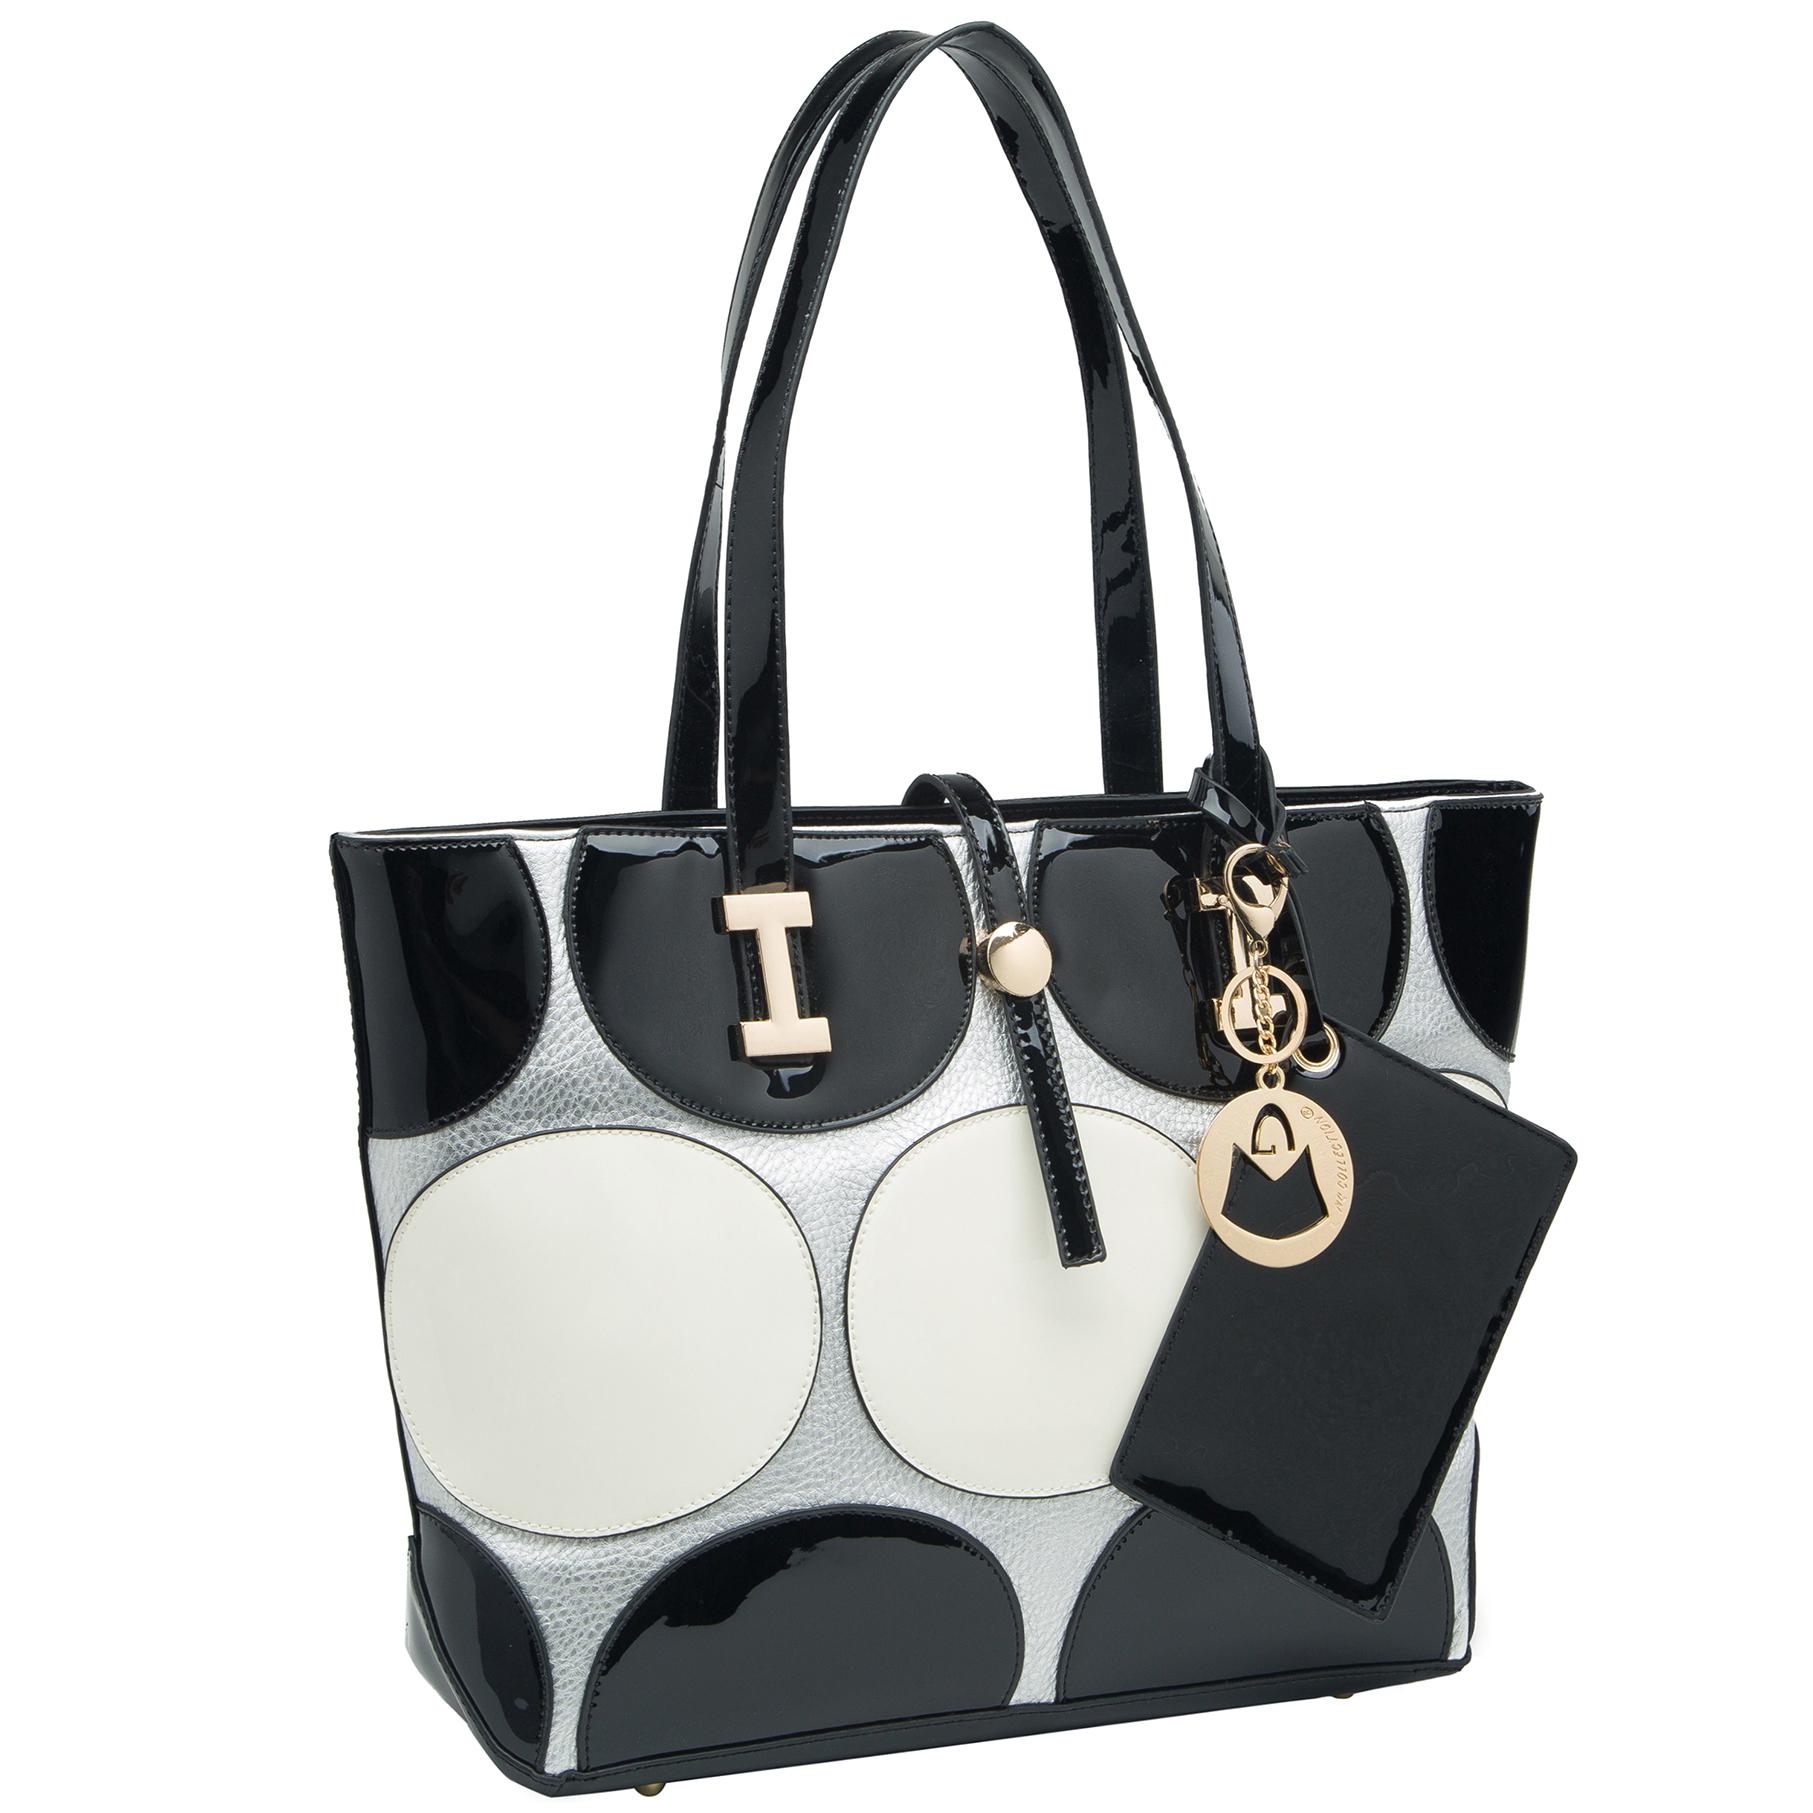 April retro leatherette top handle designer handbag main image